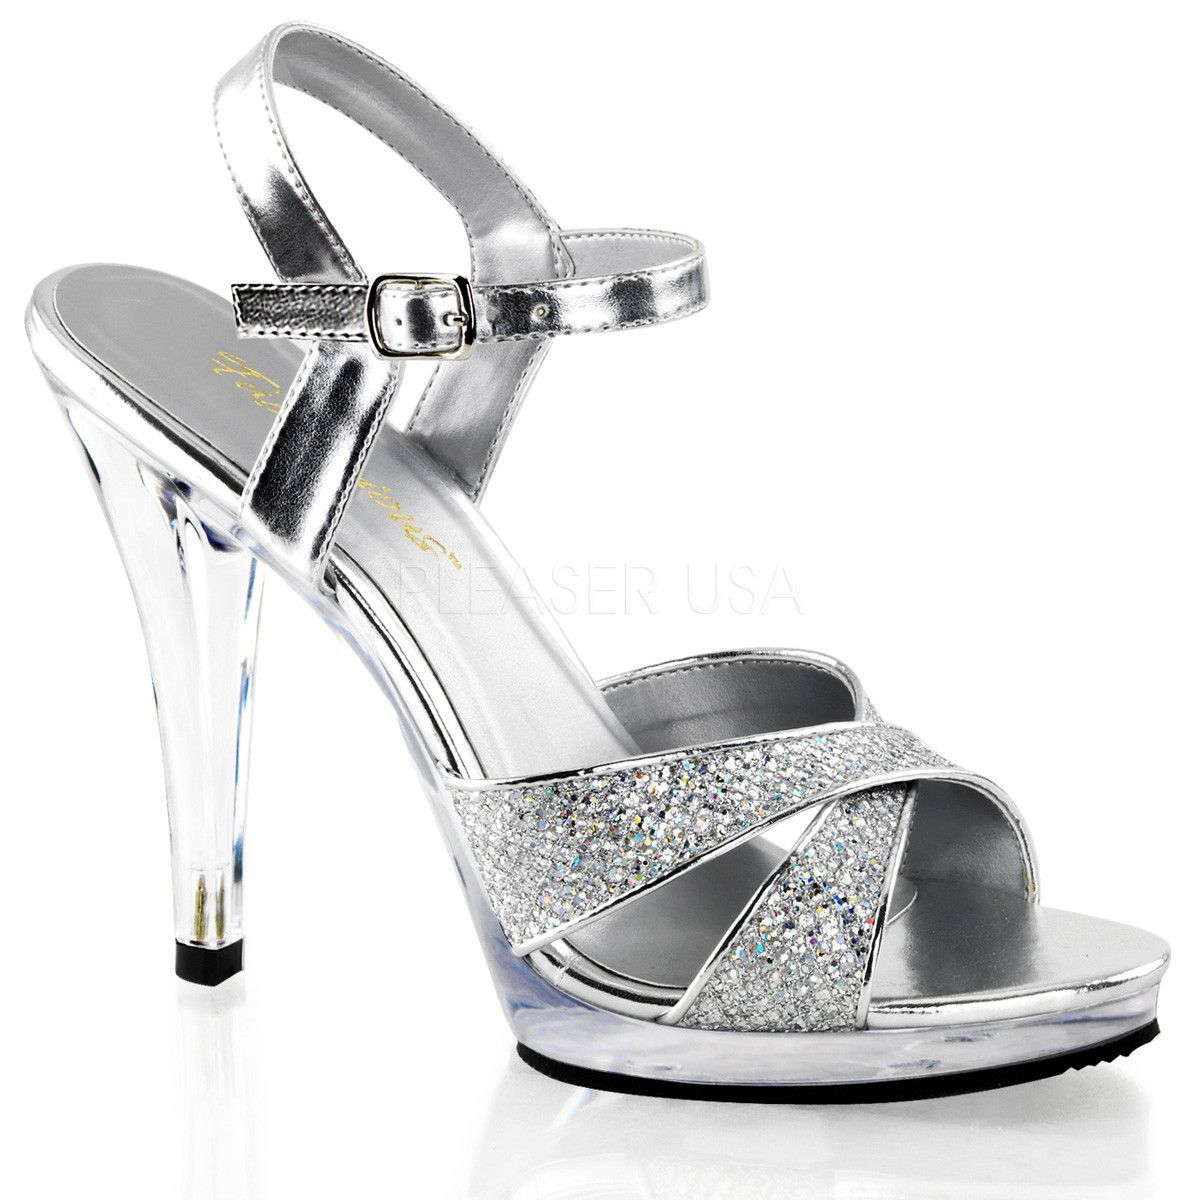 Black sandals 2 inch heel - Silver 4 1 2 Inch Heel 1 2 Inch Platform Sexy Open Toe